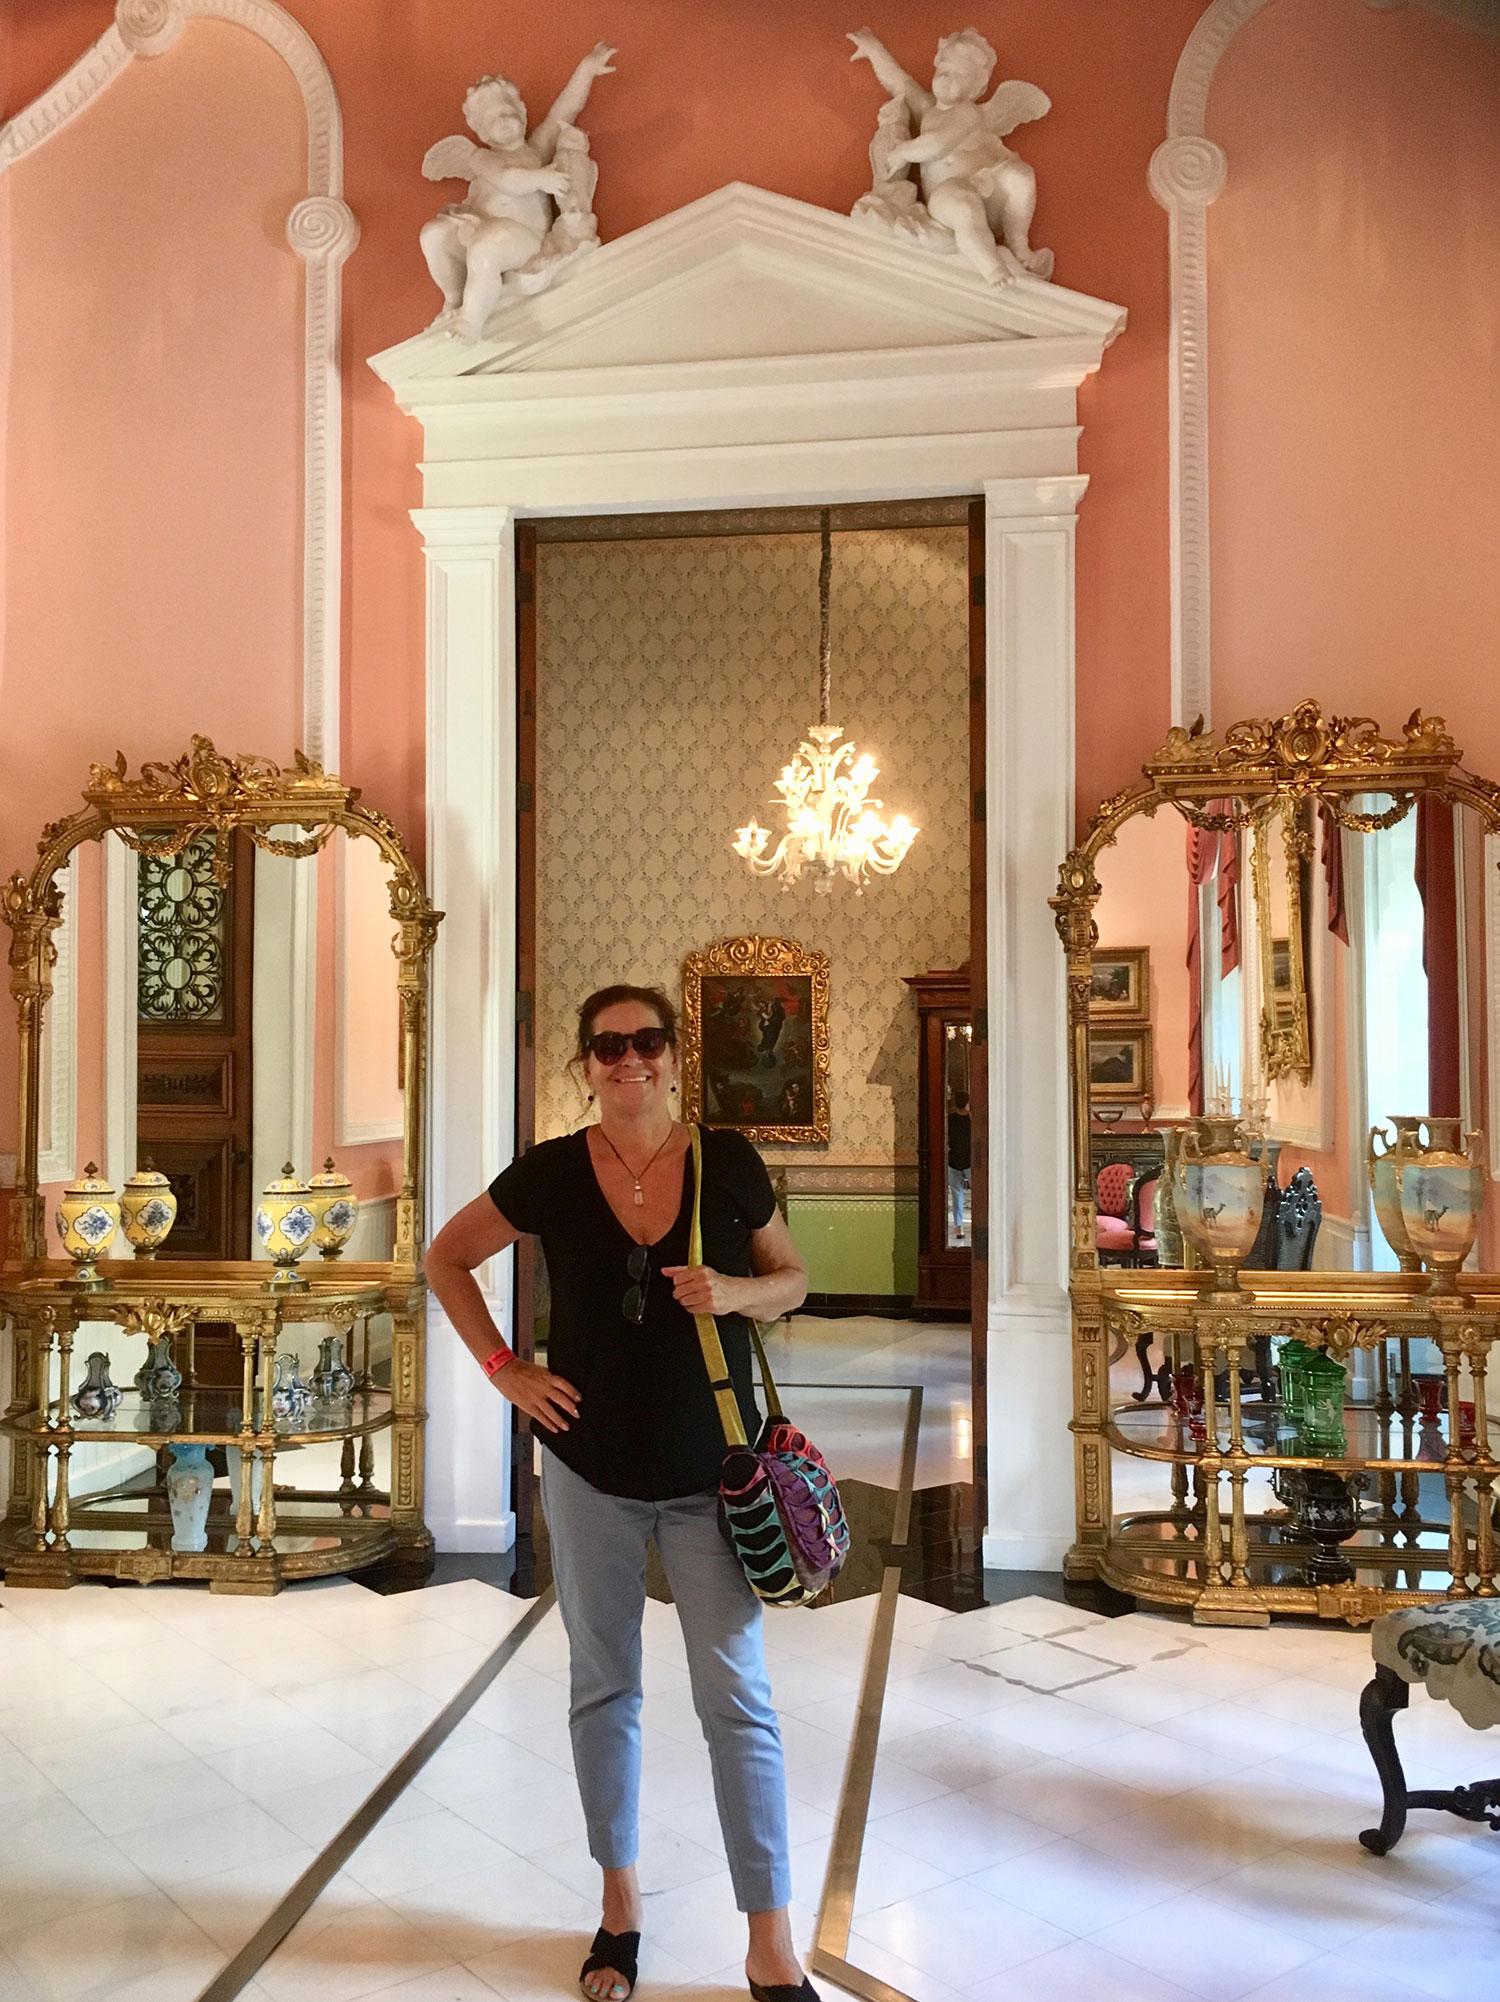 Hammocks_and_Ruins_Blog_Riviera_Maya_Mexico_Travel_Discover_Yucatan_What_to_do_Museums_Casa_Montejo_14.jpg